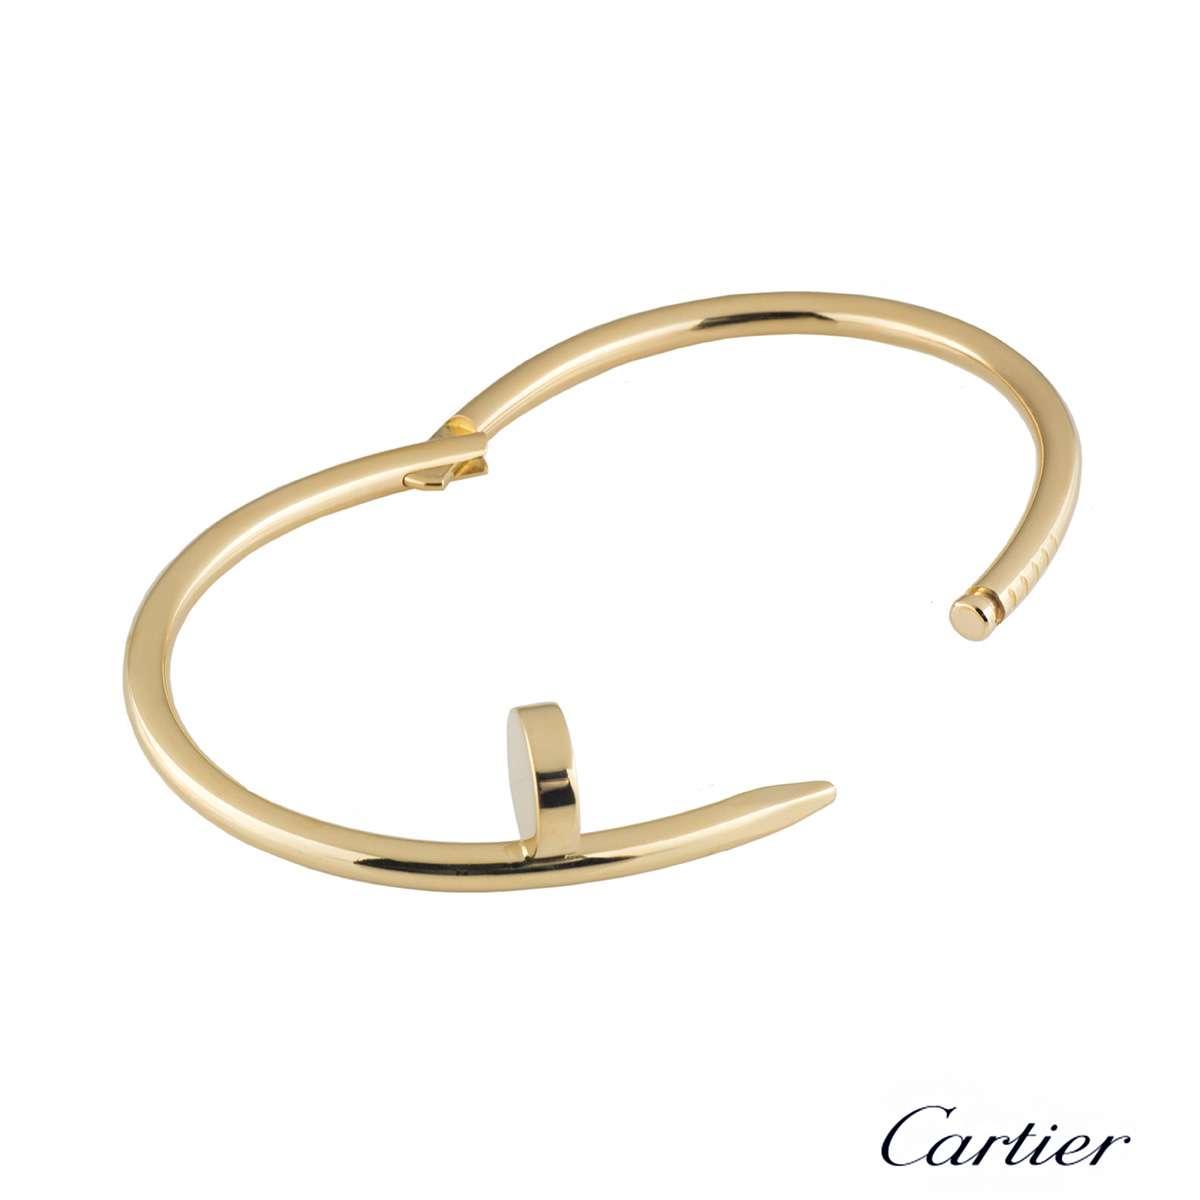 Cartier Infinity Bracelet: Cartier Juste Un Clou Bracelet